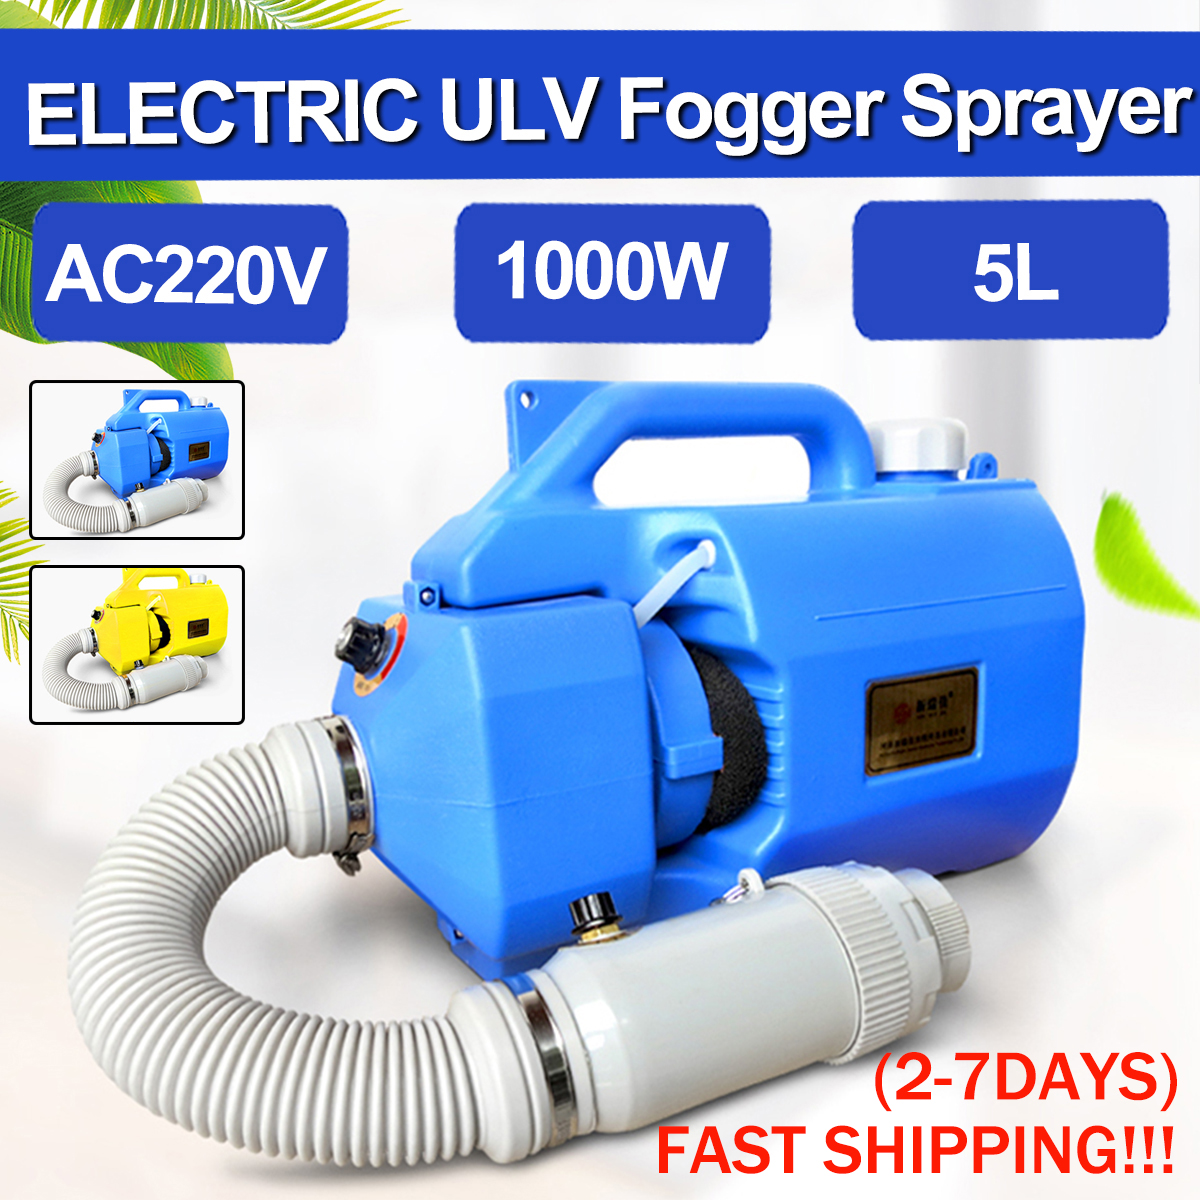 220V 1400W Electric ULV Fogger Sprayer Cold Fogging 4.5L Ultra Low Volume Nebulizer Sterilizer For Disinfection Atomizer